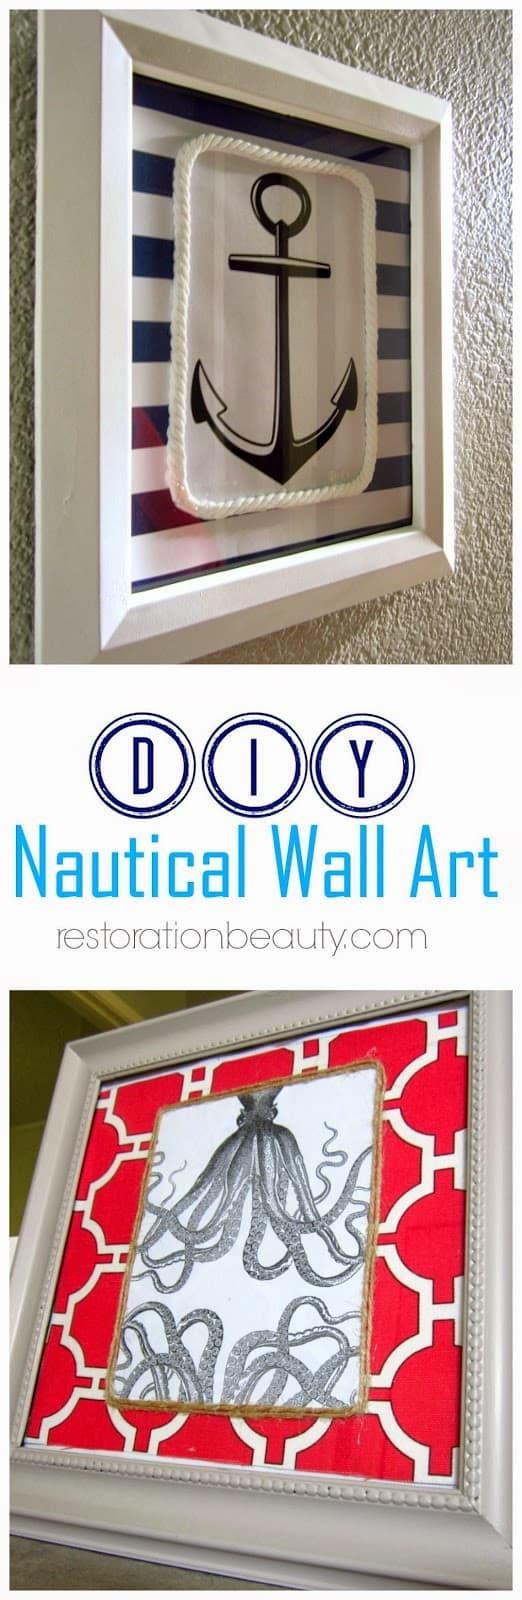 diy nautical wall art 10